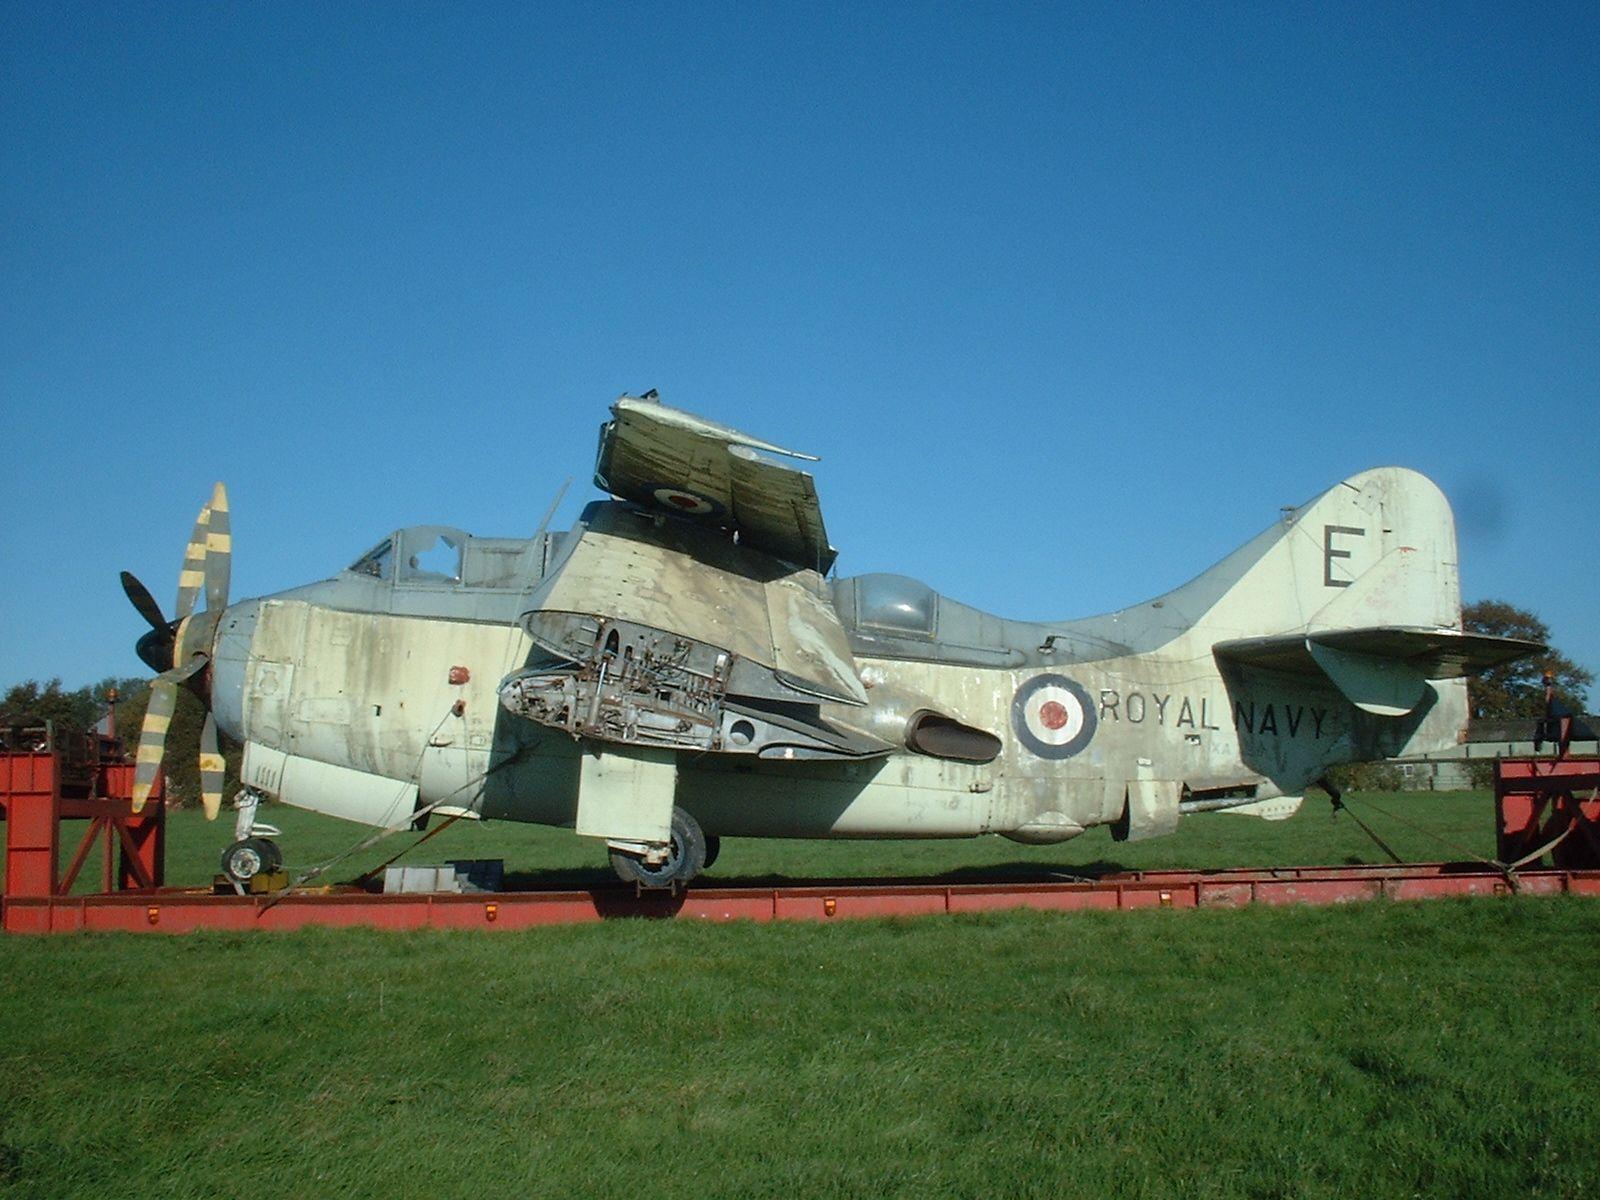 Fairey XA459. I vaguely remember these from RNAS